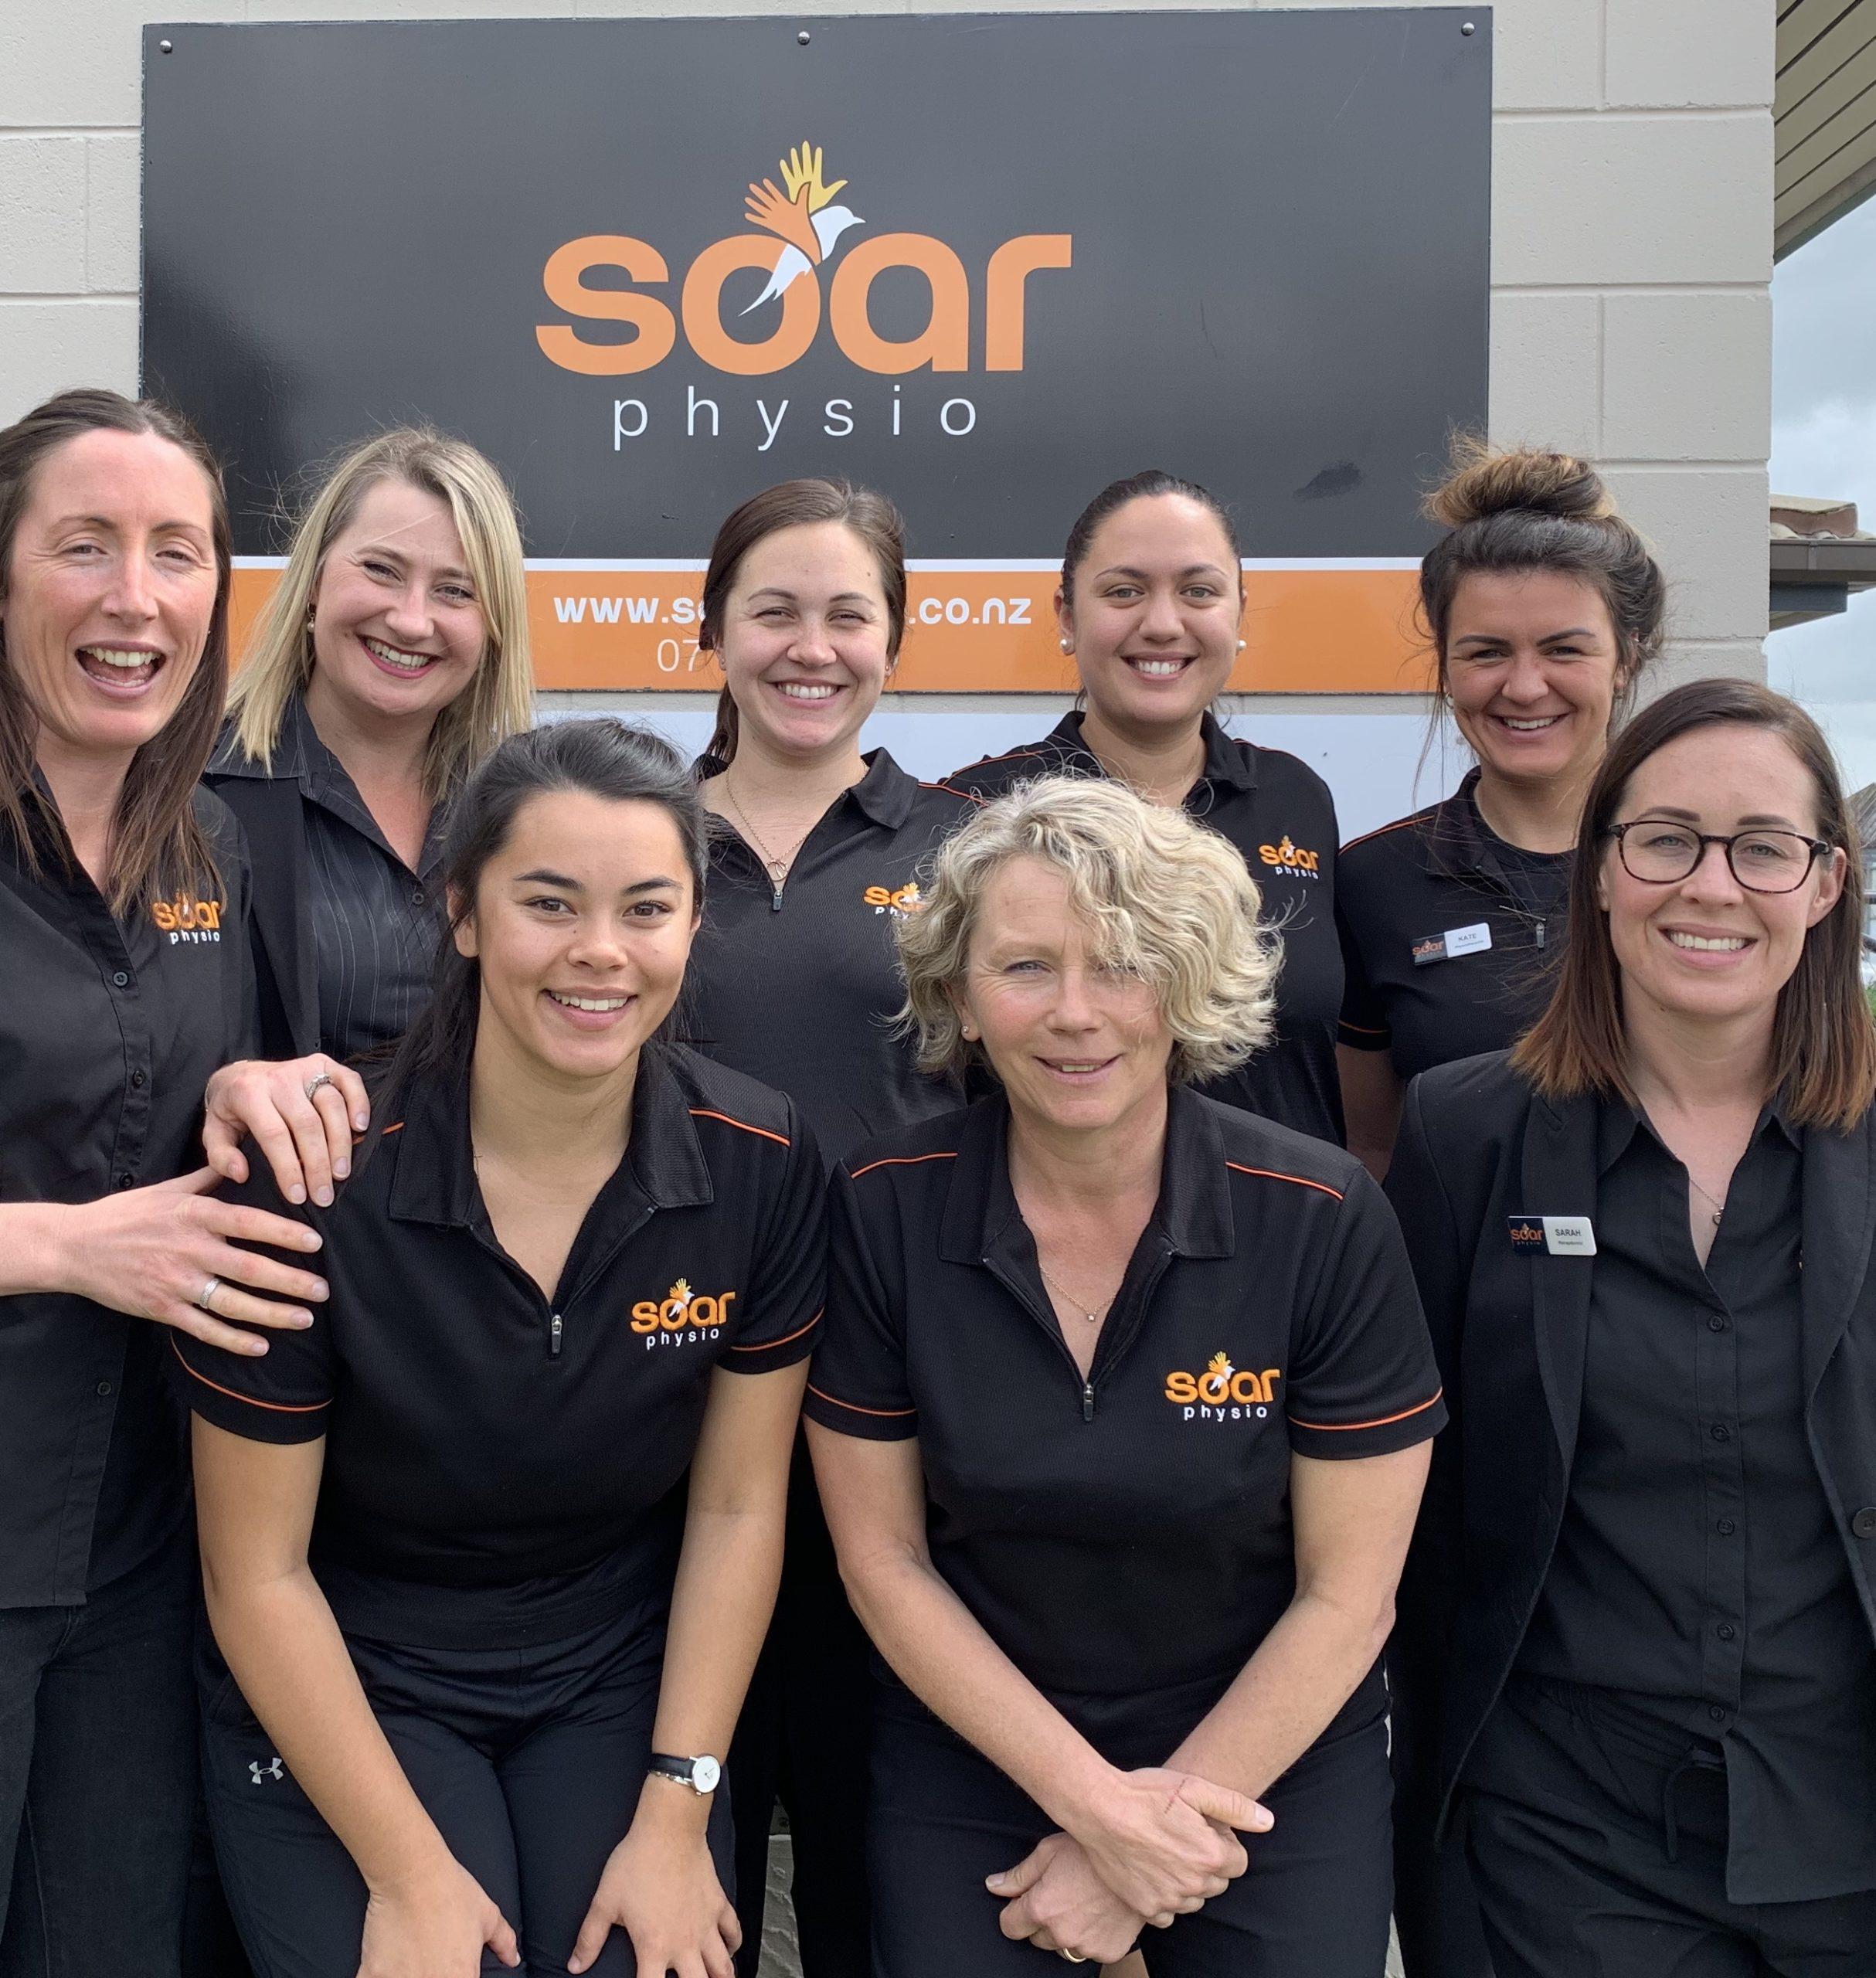 The Soar Physio team